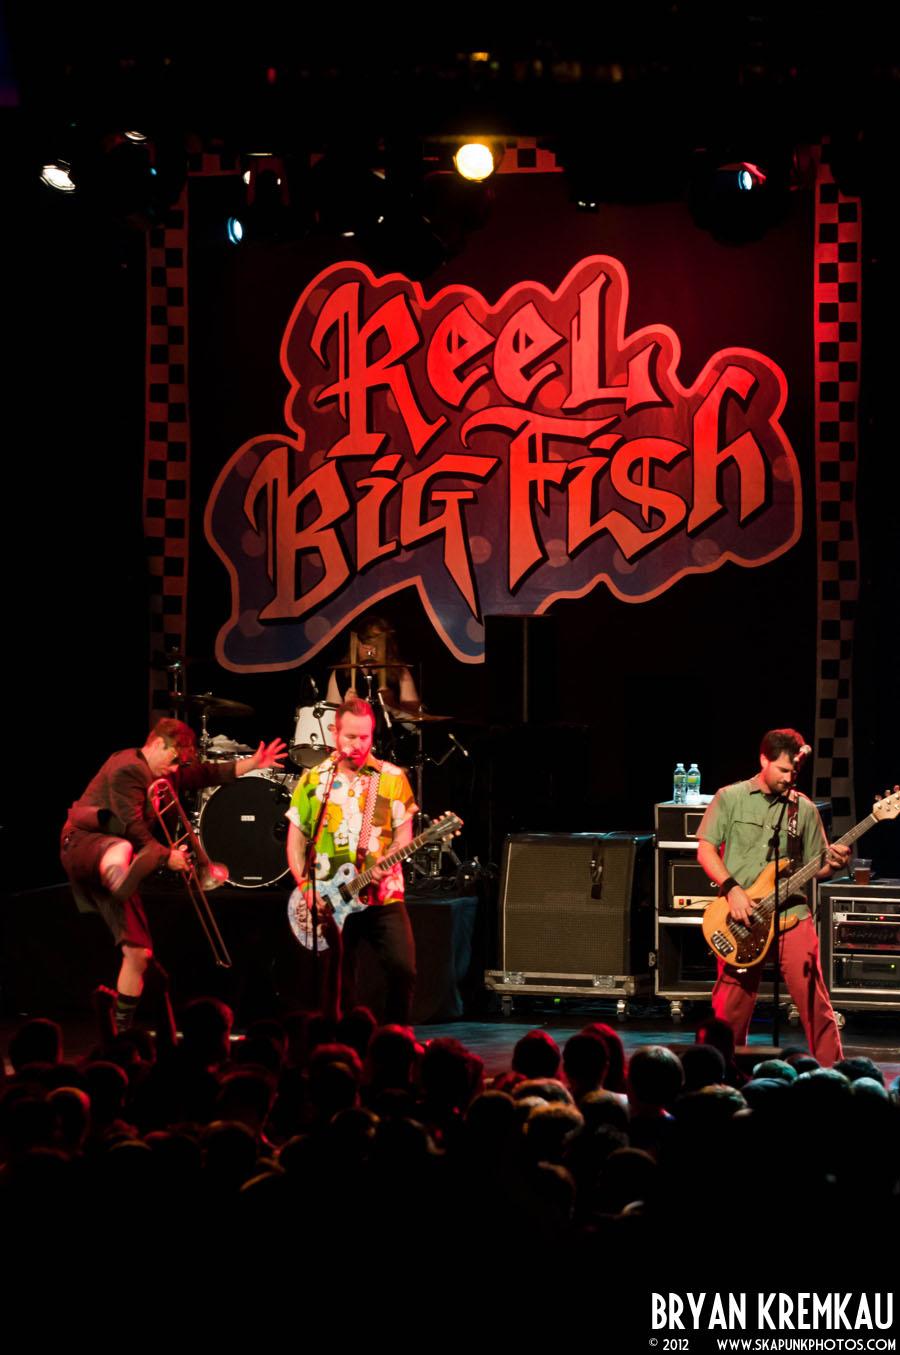 Reel Big Fish @ Best Buy Theater, NYC – 6.27.12